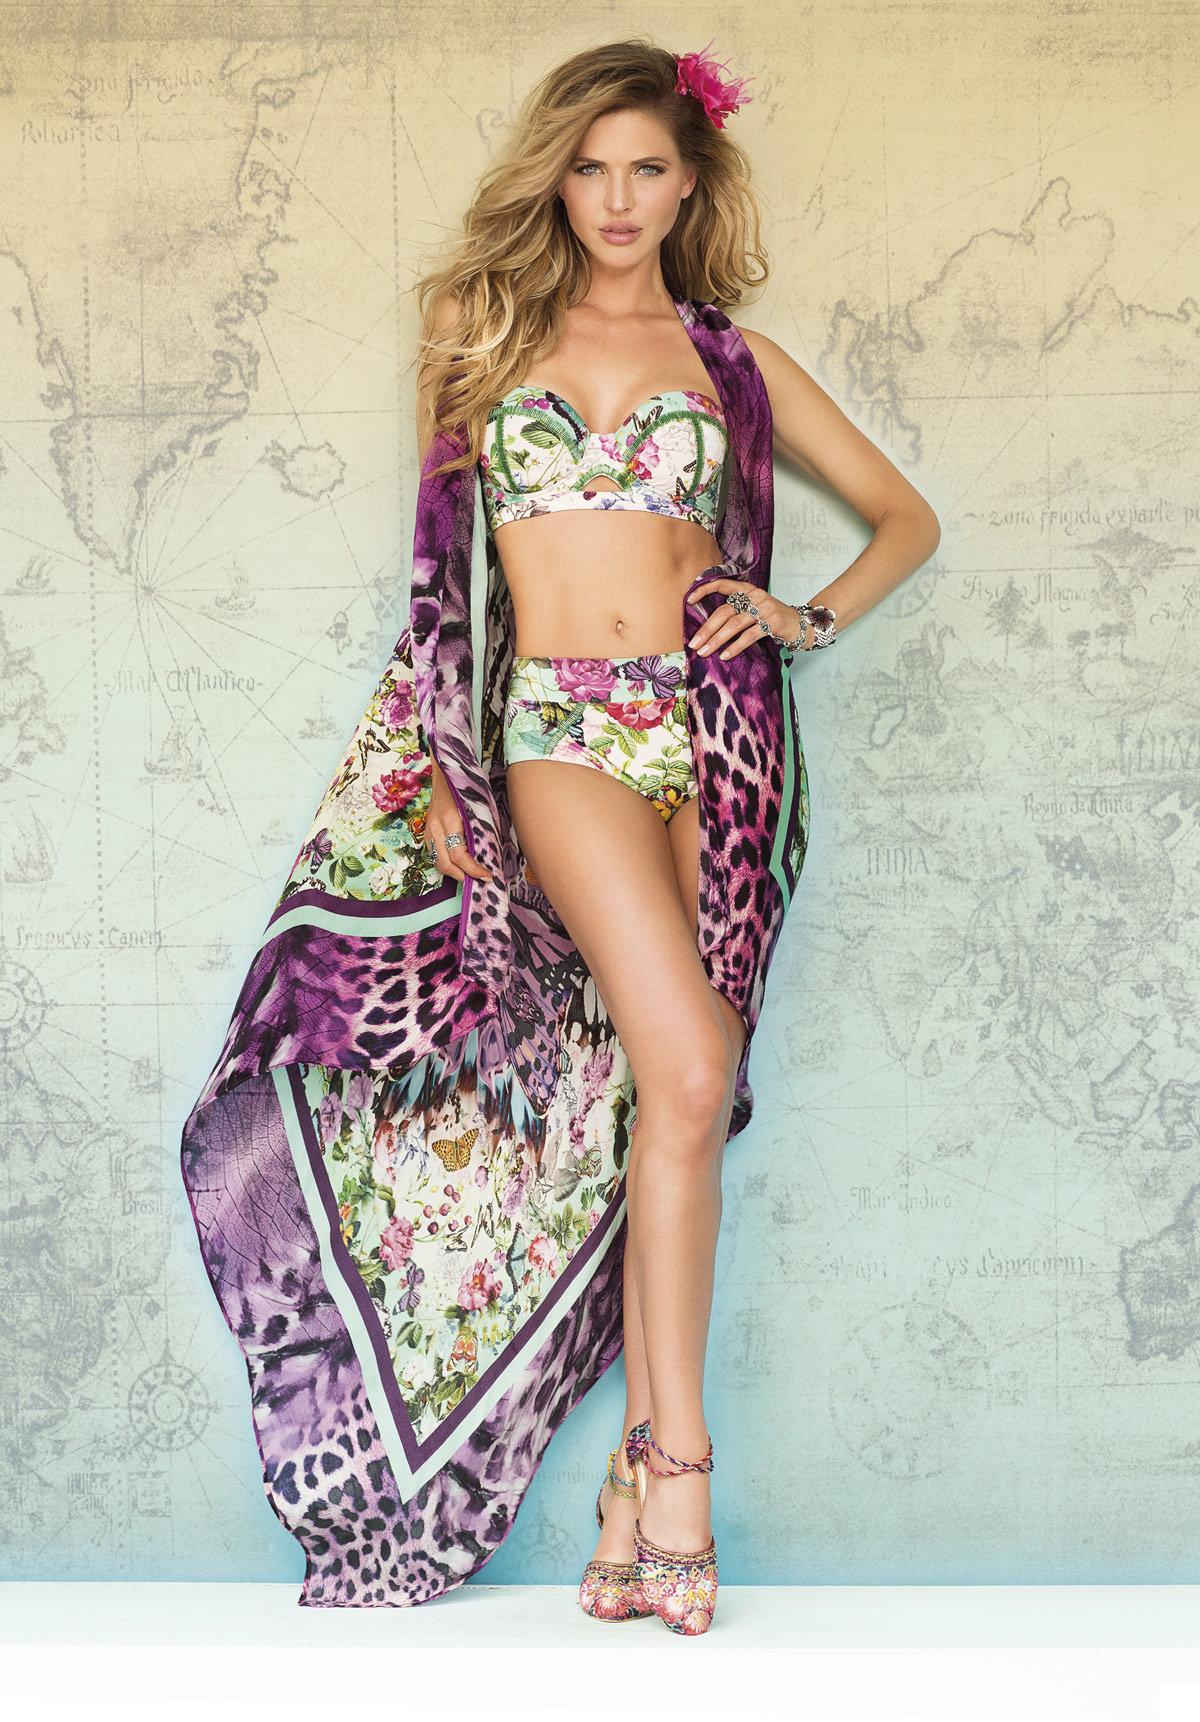 Paradizia Swimwear: Pink Butterflies Bustier (Shown with Matching High Waisted Bikini Bottoms!)